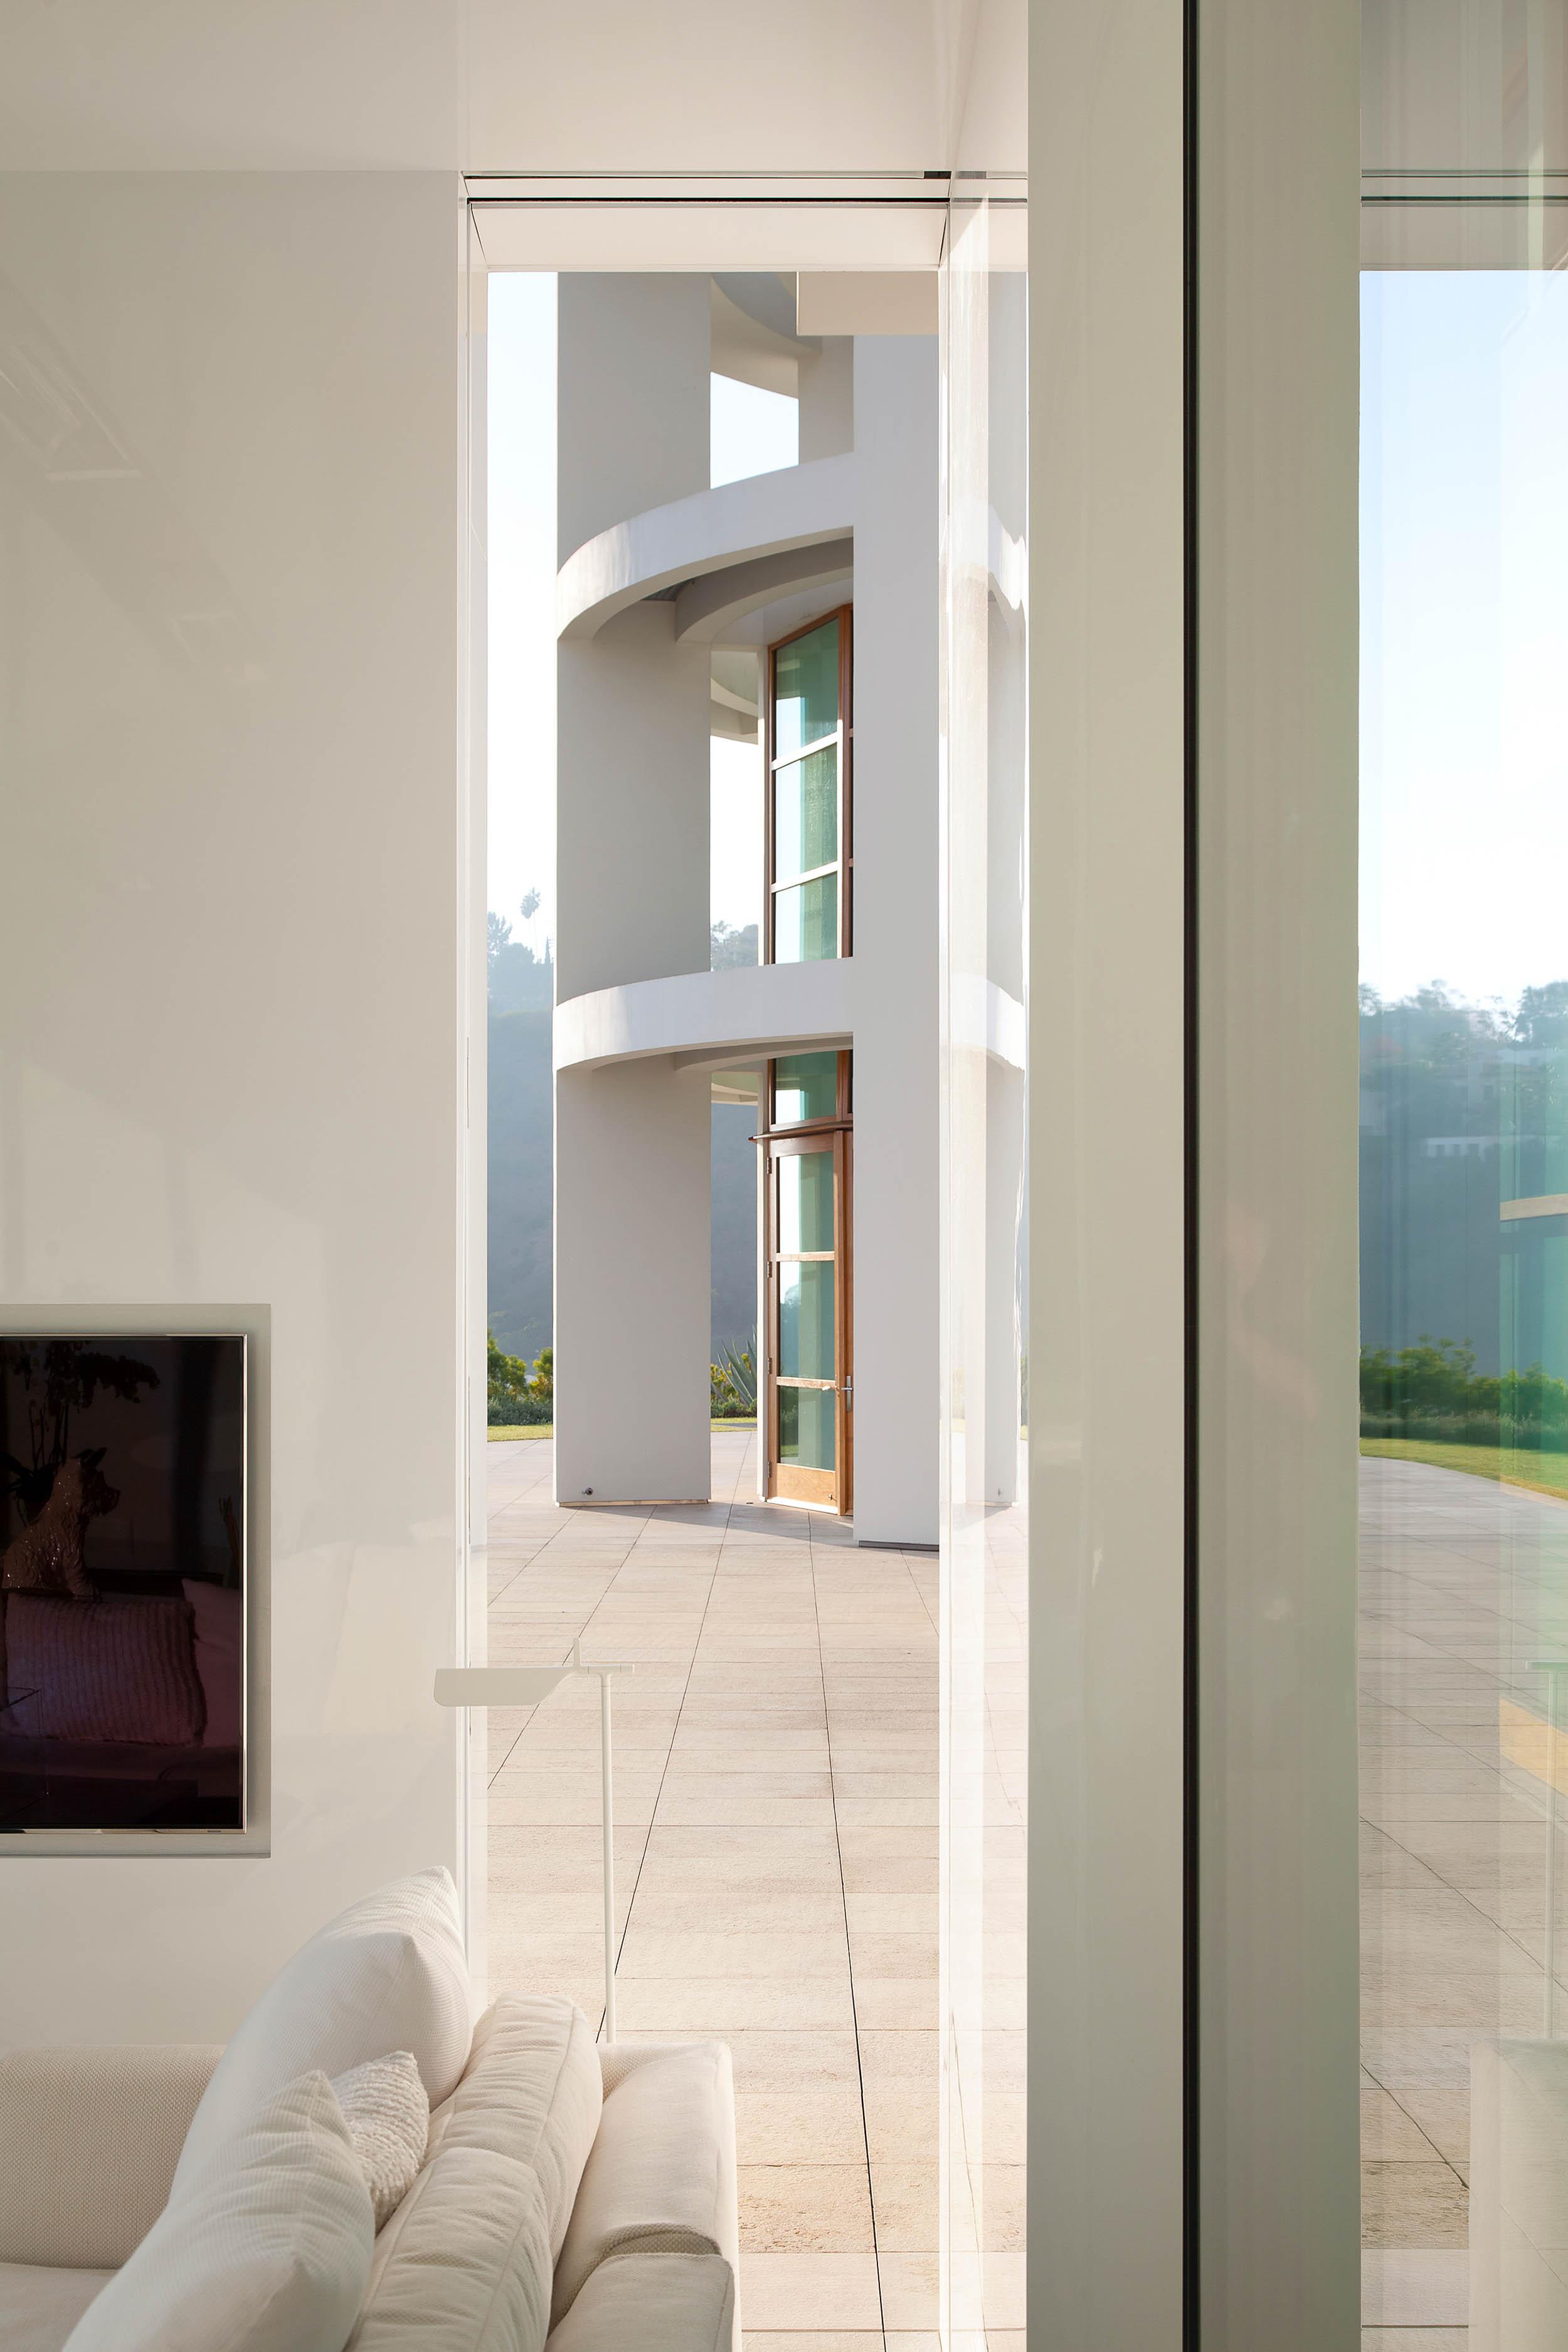 Air Frame Pavillion - Rios Clementi Hale Studios